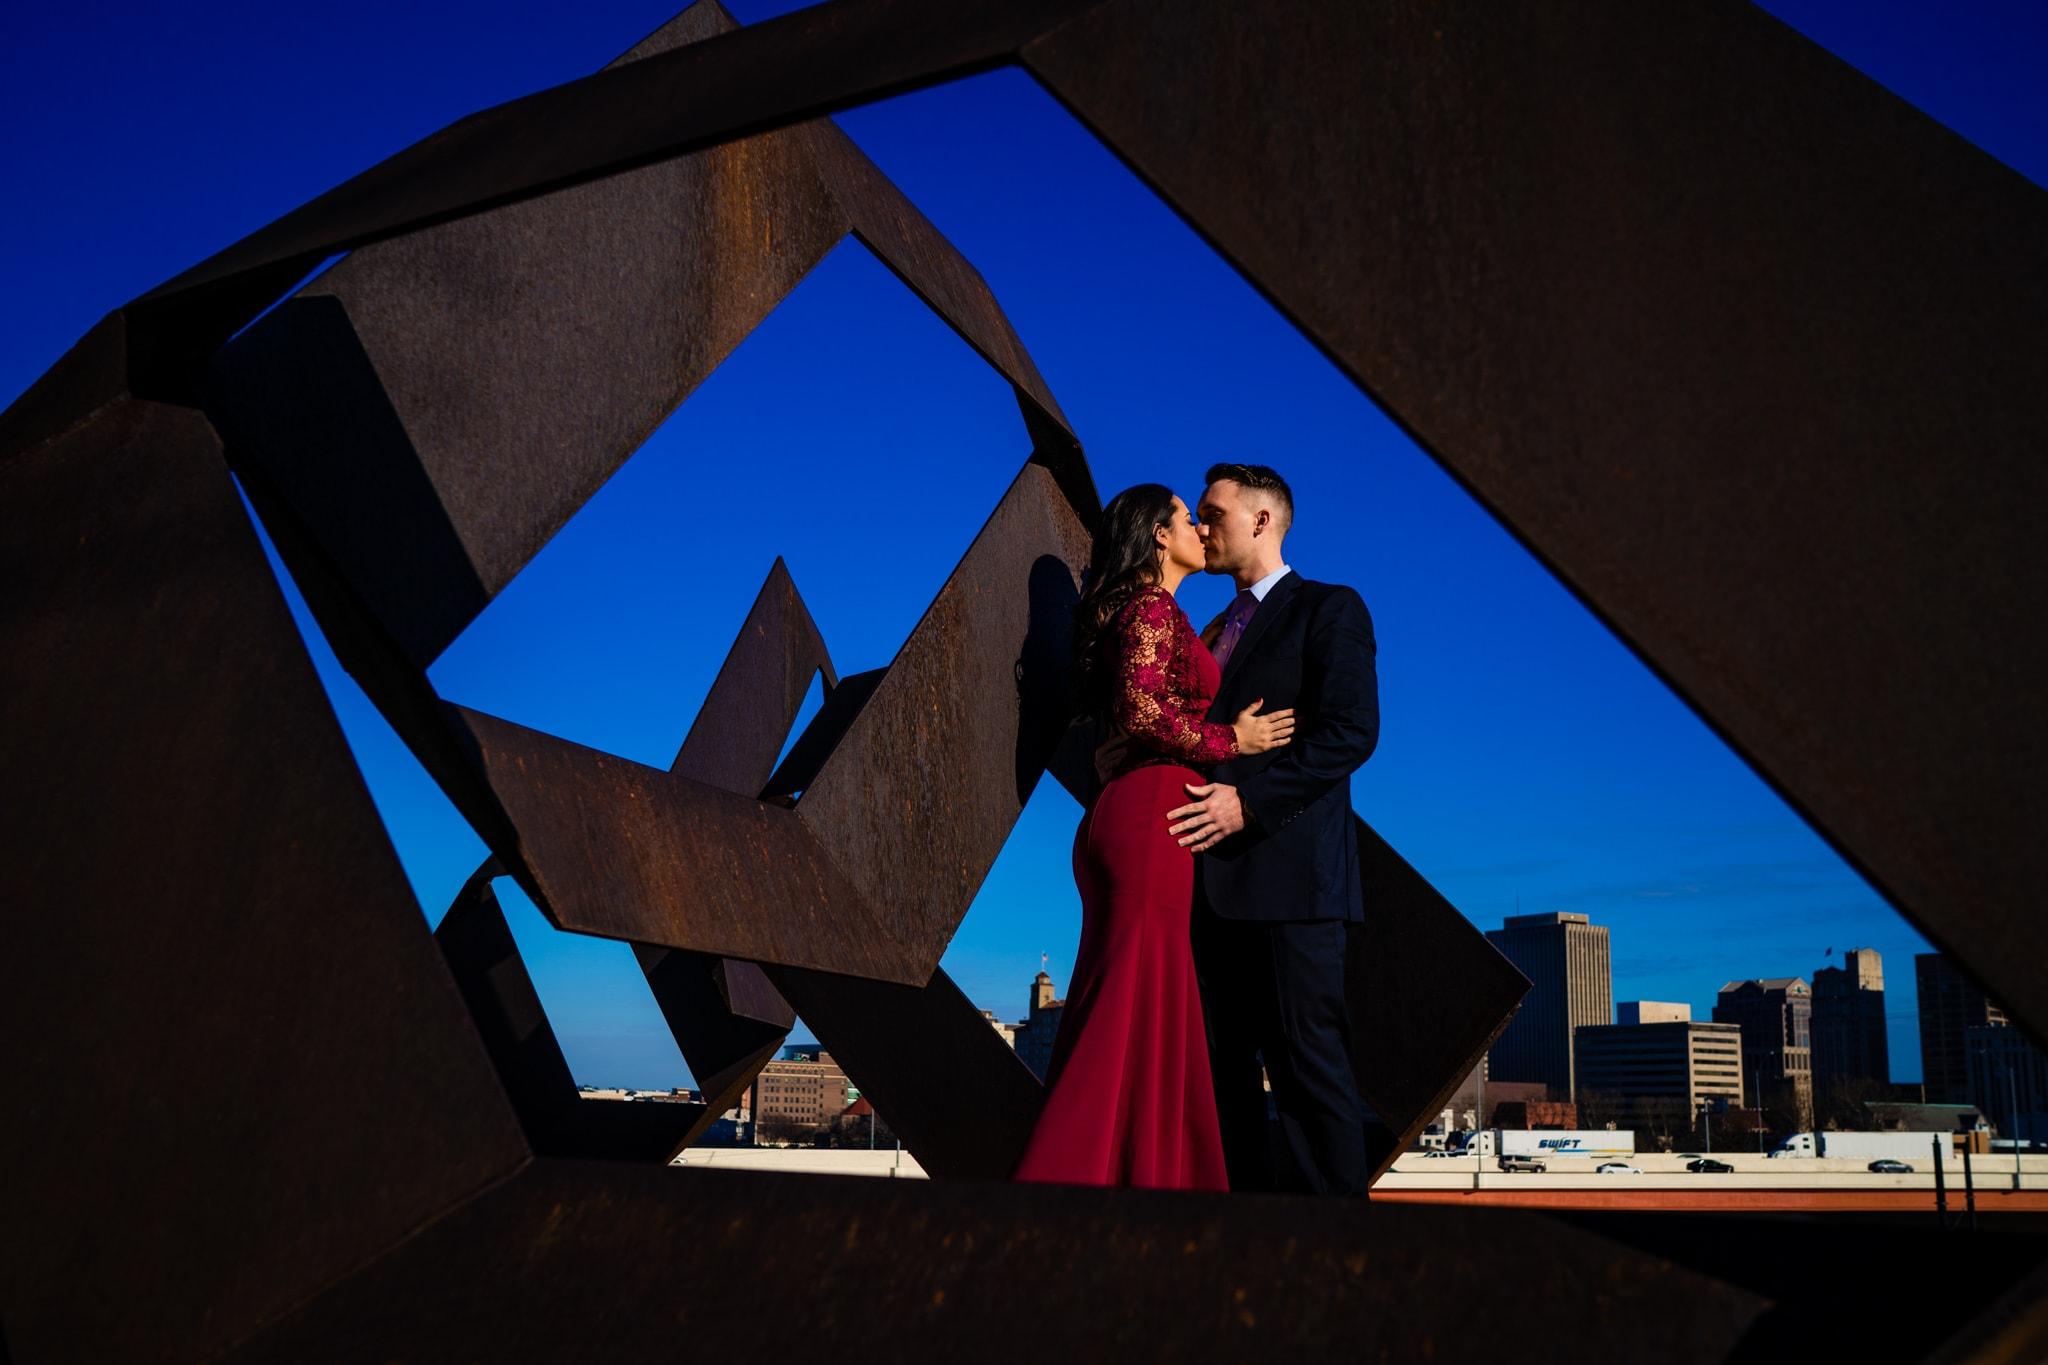 Engagement Photos at the Dayton Art Institute - Dayton Engagement Photos - Studio 22 Photography